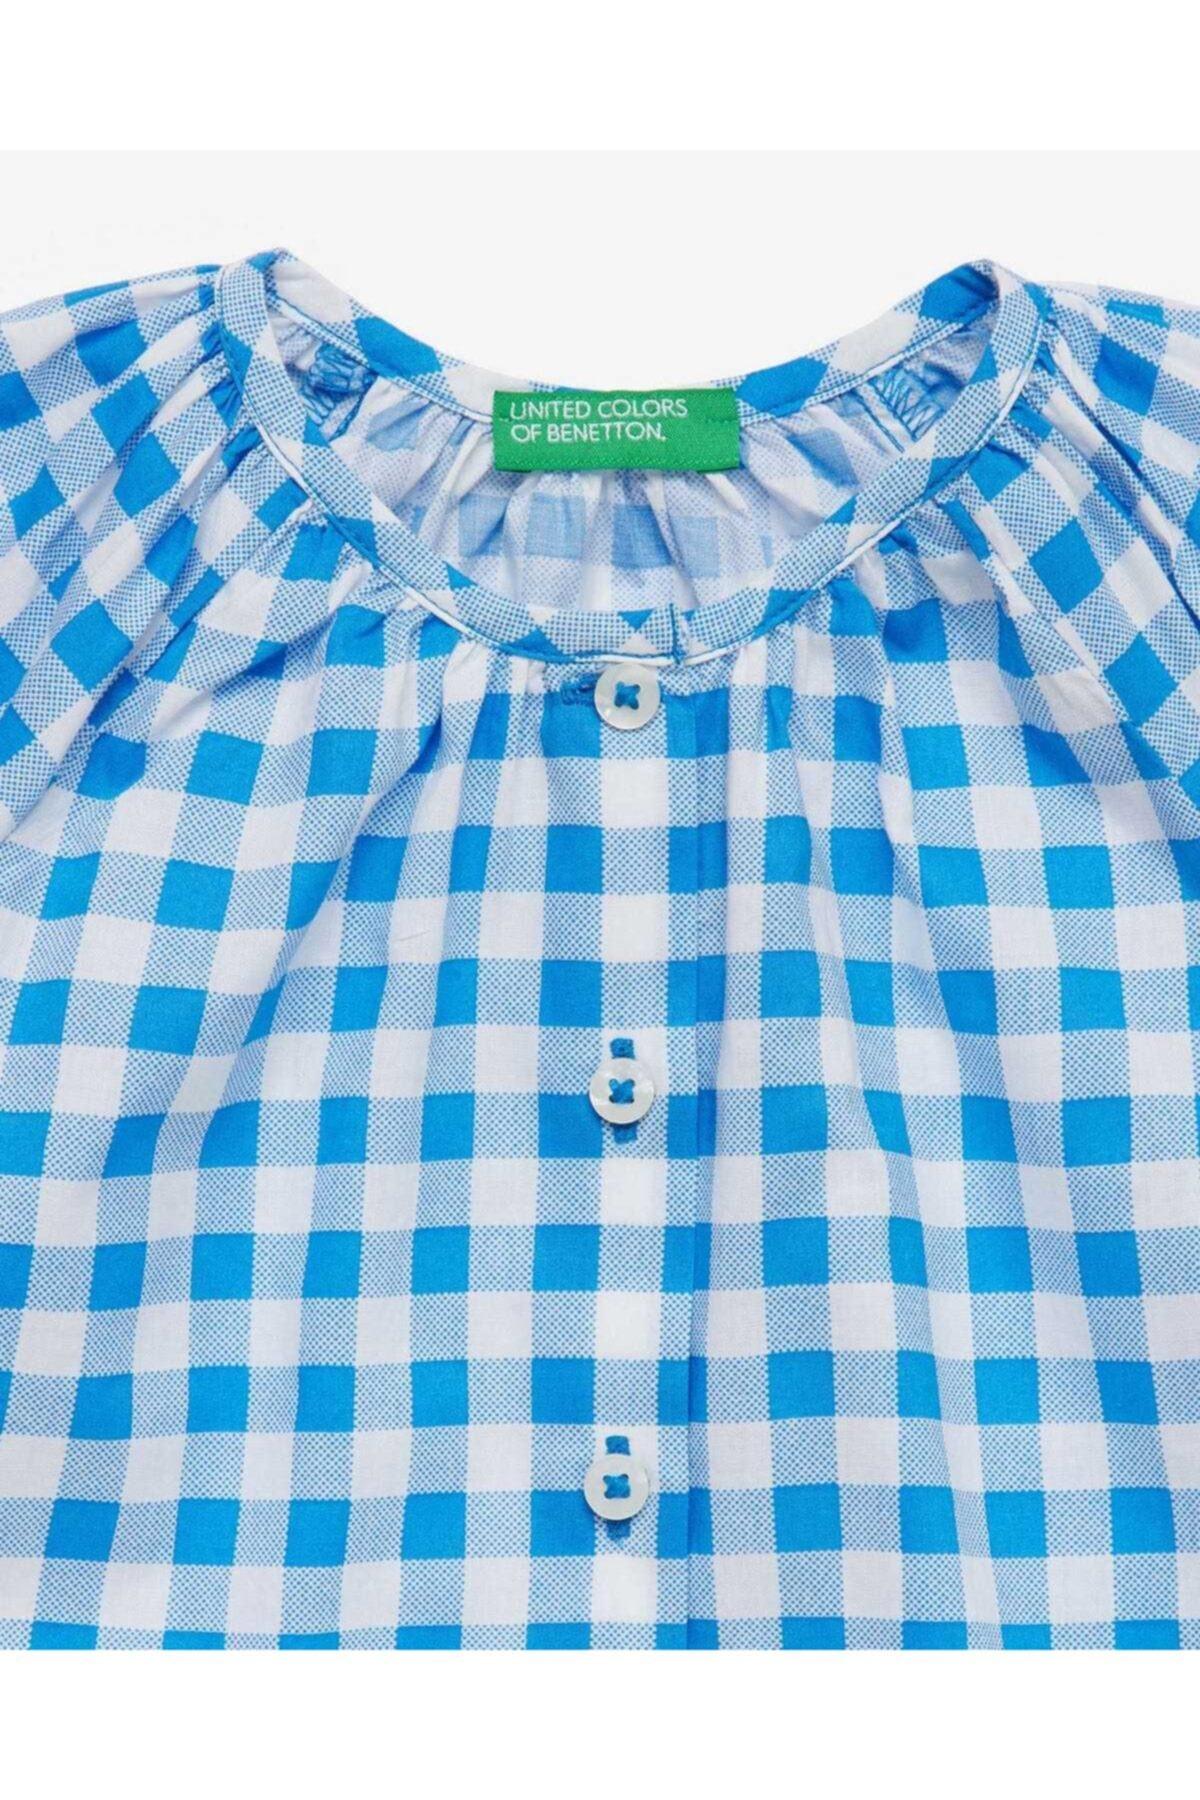 United Colors of Benetton Renkli Kareli Bluz 2